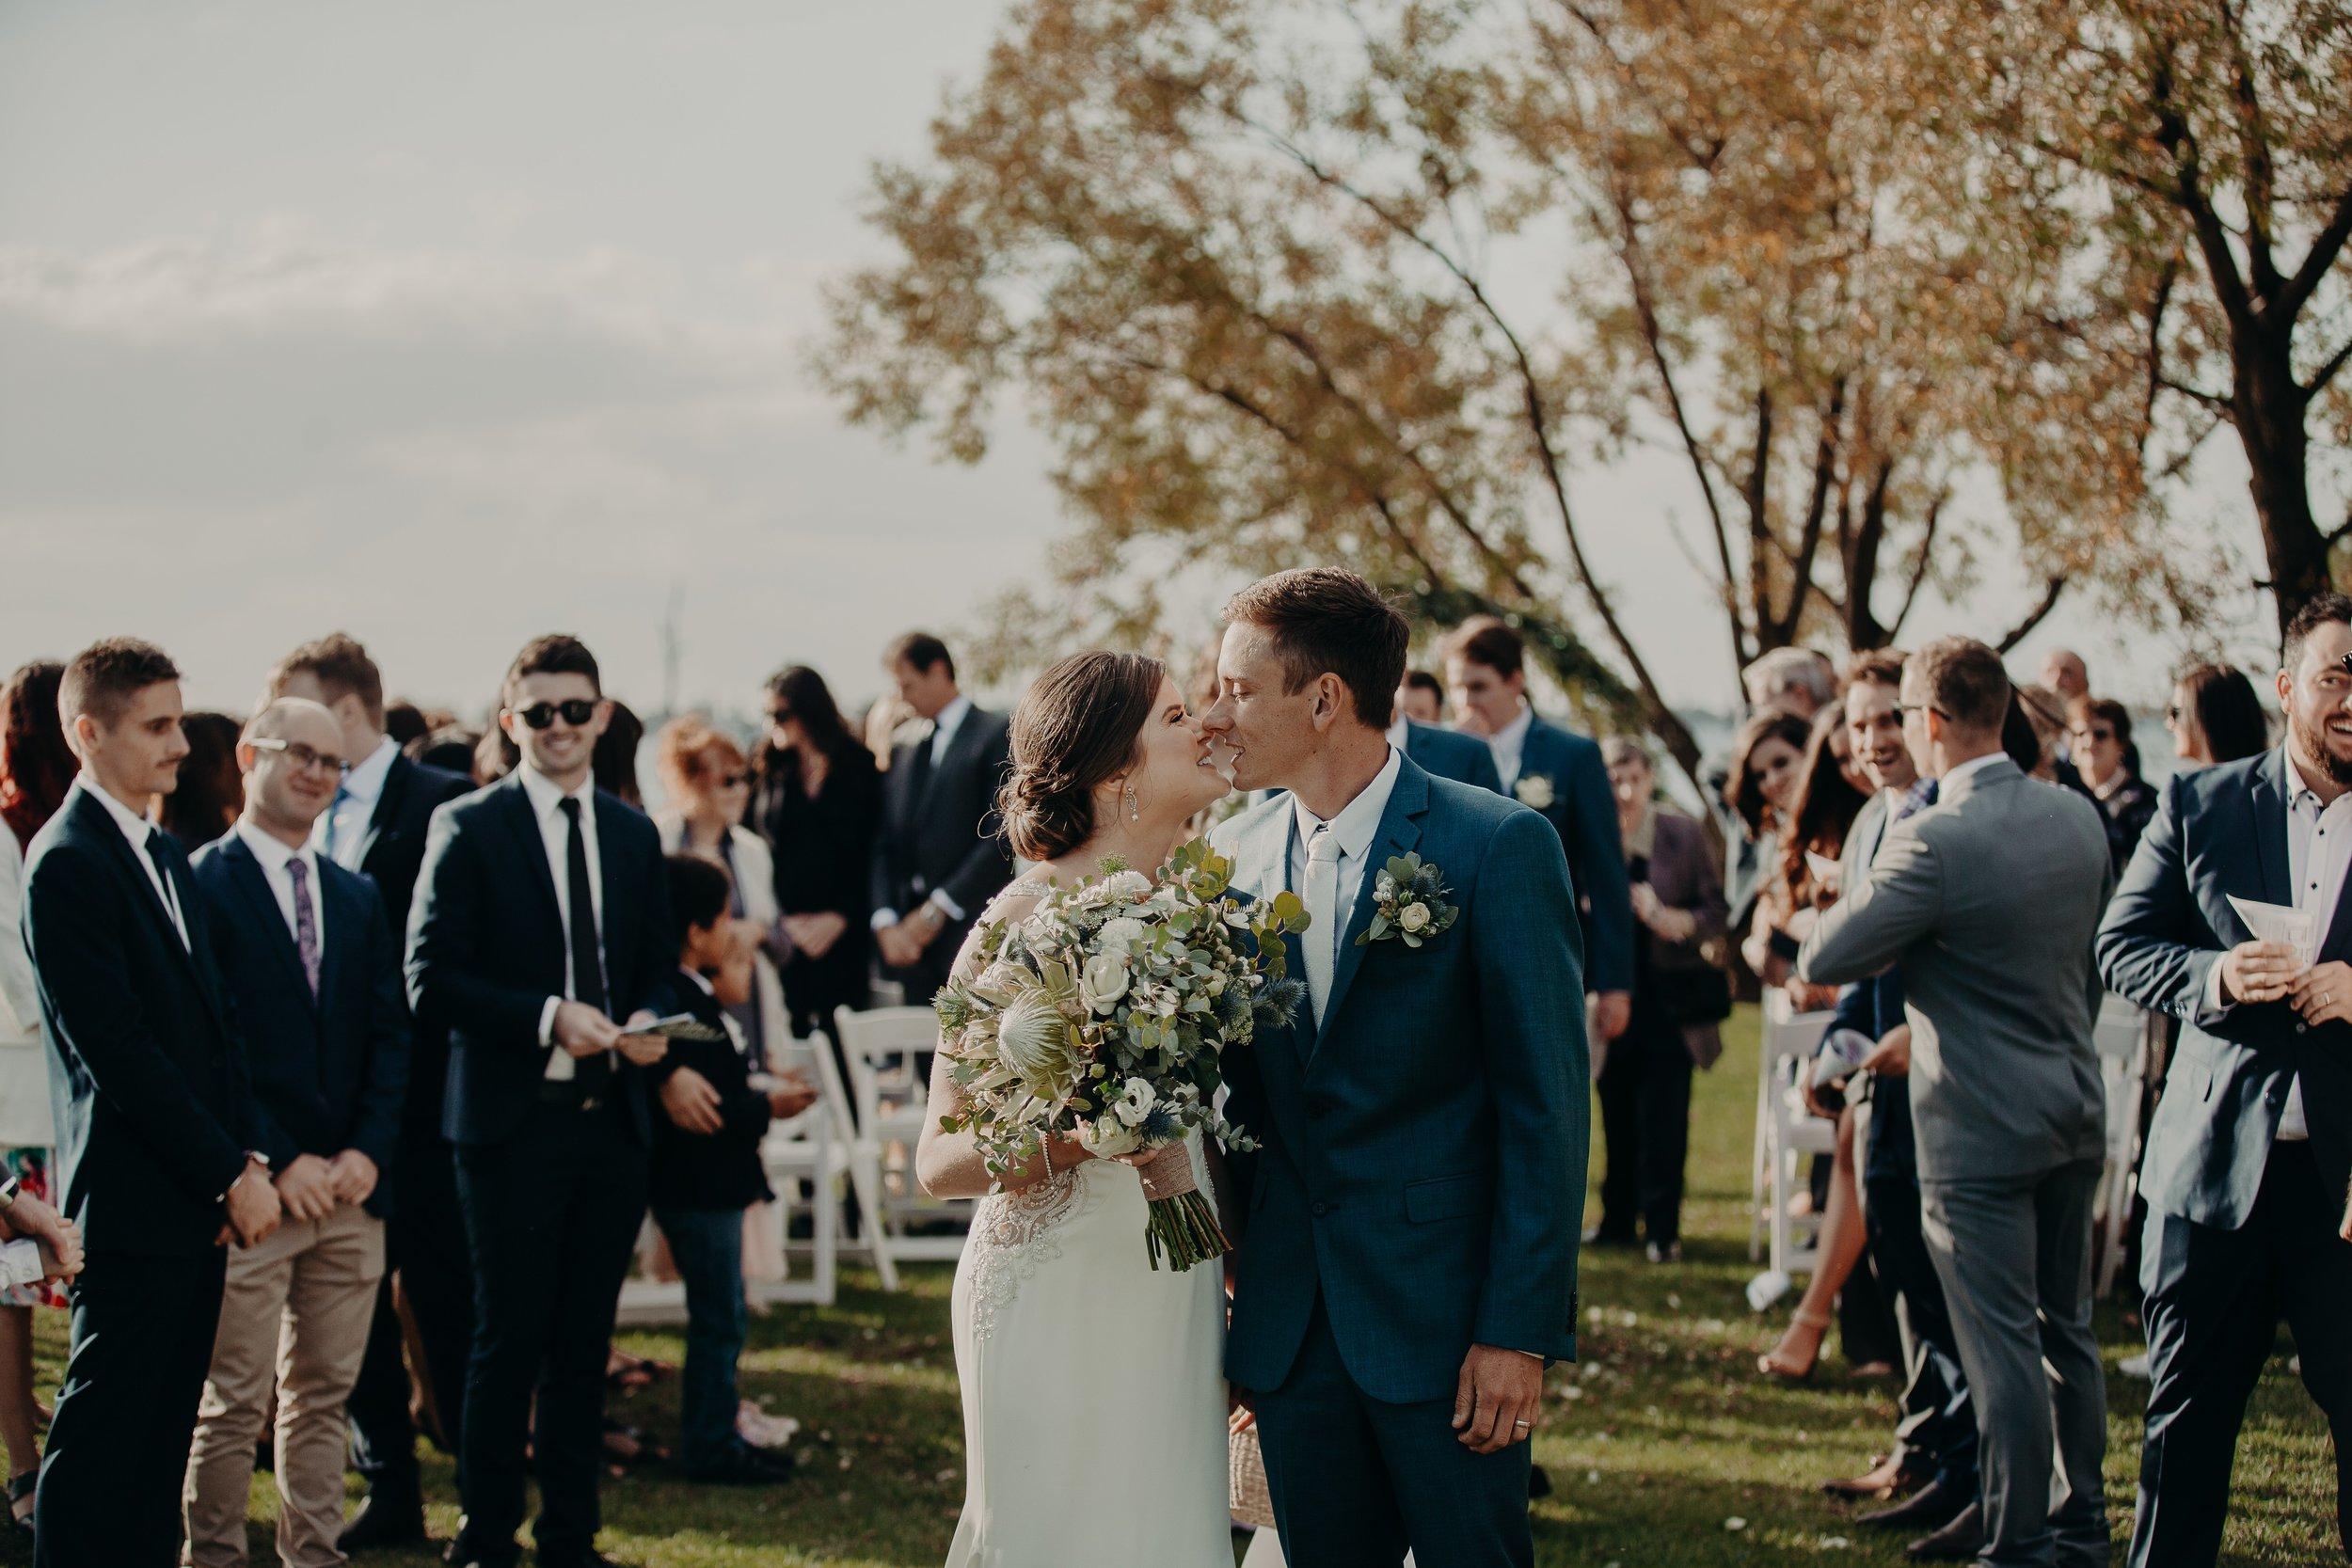 mickalathomas_puremacphotography_weddingphotographer_couplephotographer_Sheppartonphotographer_2546.jpg